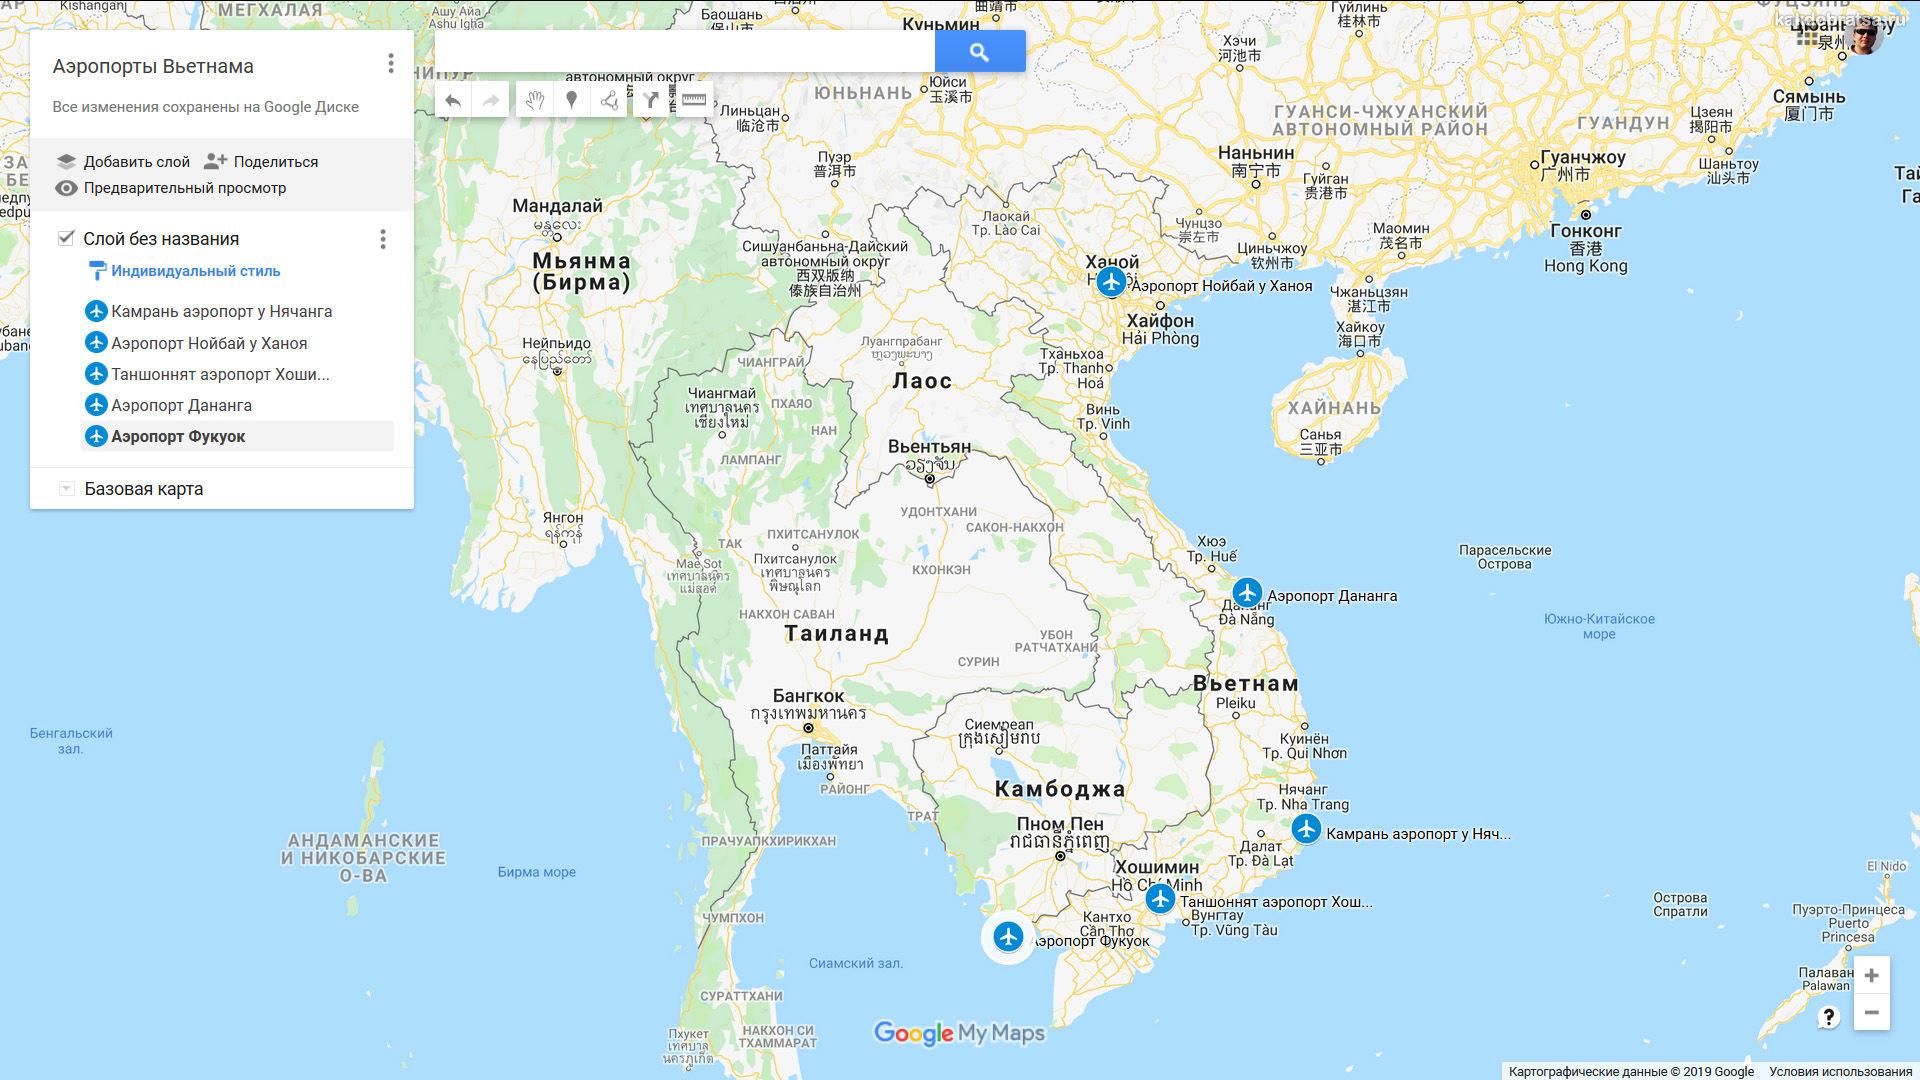 Аэропорты Вьетнама на карте